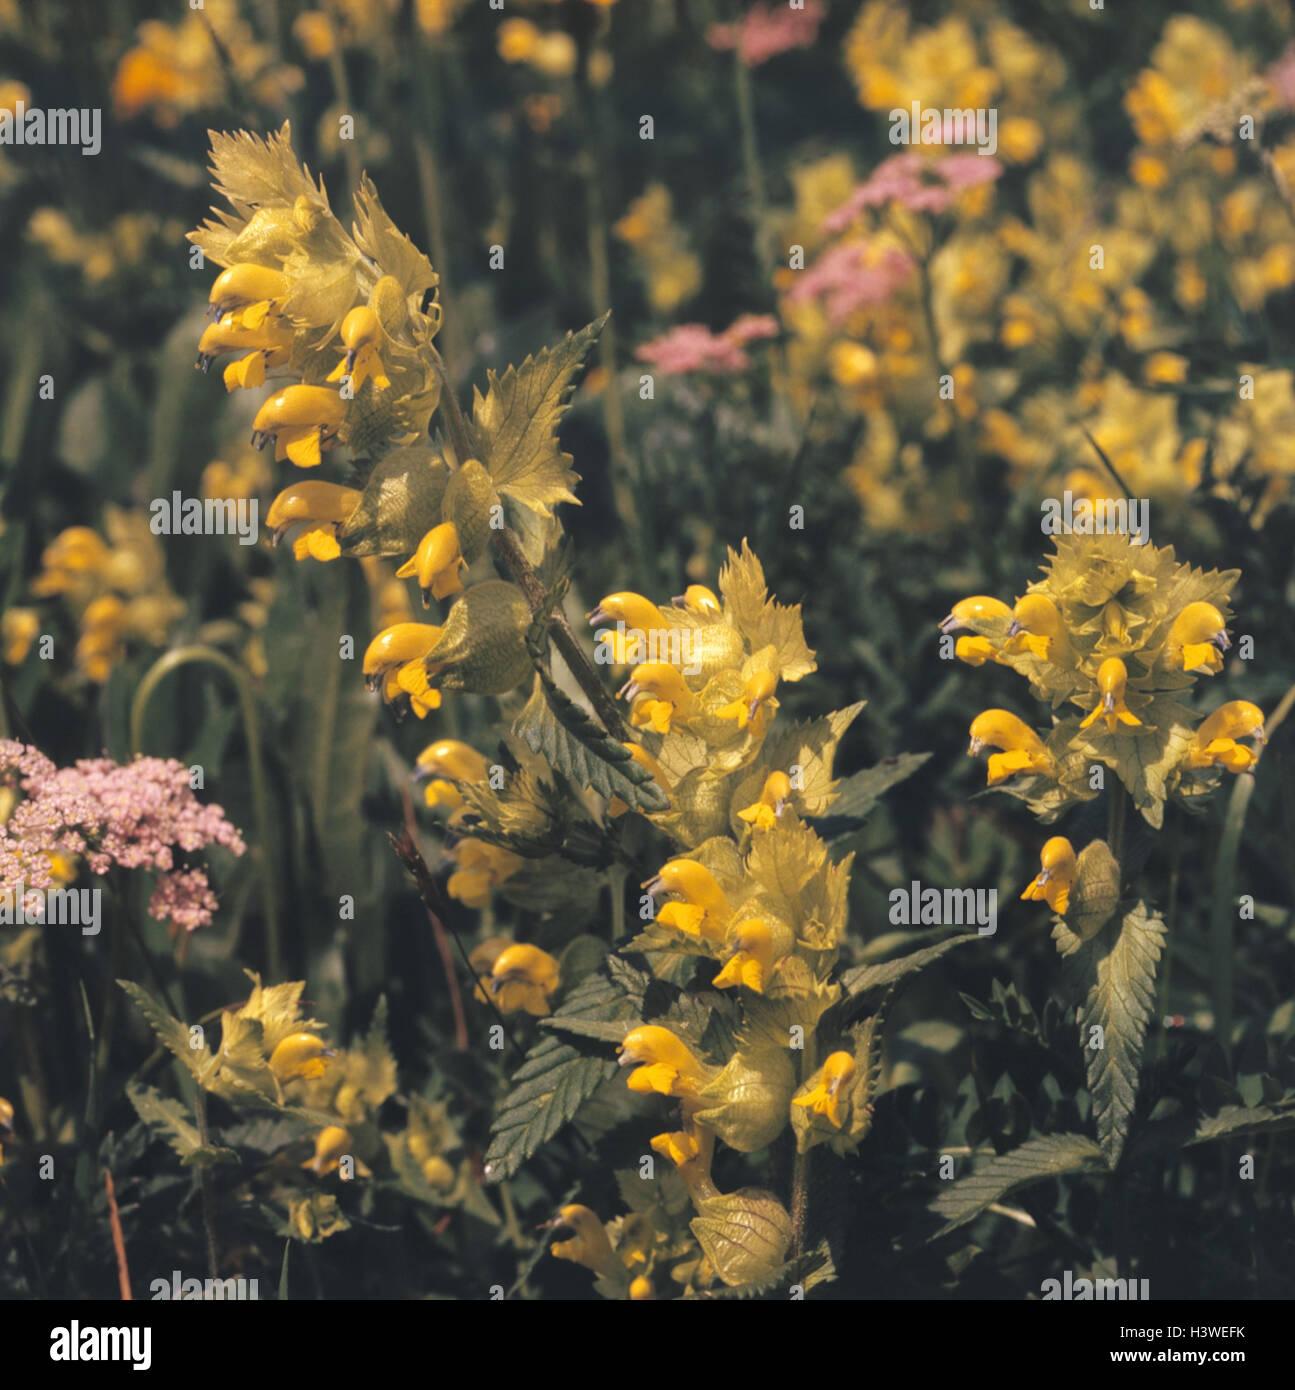 gro rasseln topf rhinanthus grandiflora nahaufnahme blume 2005 natur botanik flora. Black Bedroom Furniture Sets. Home Design Ideas